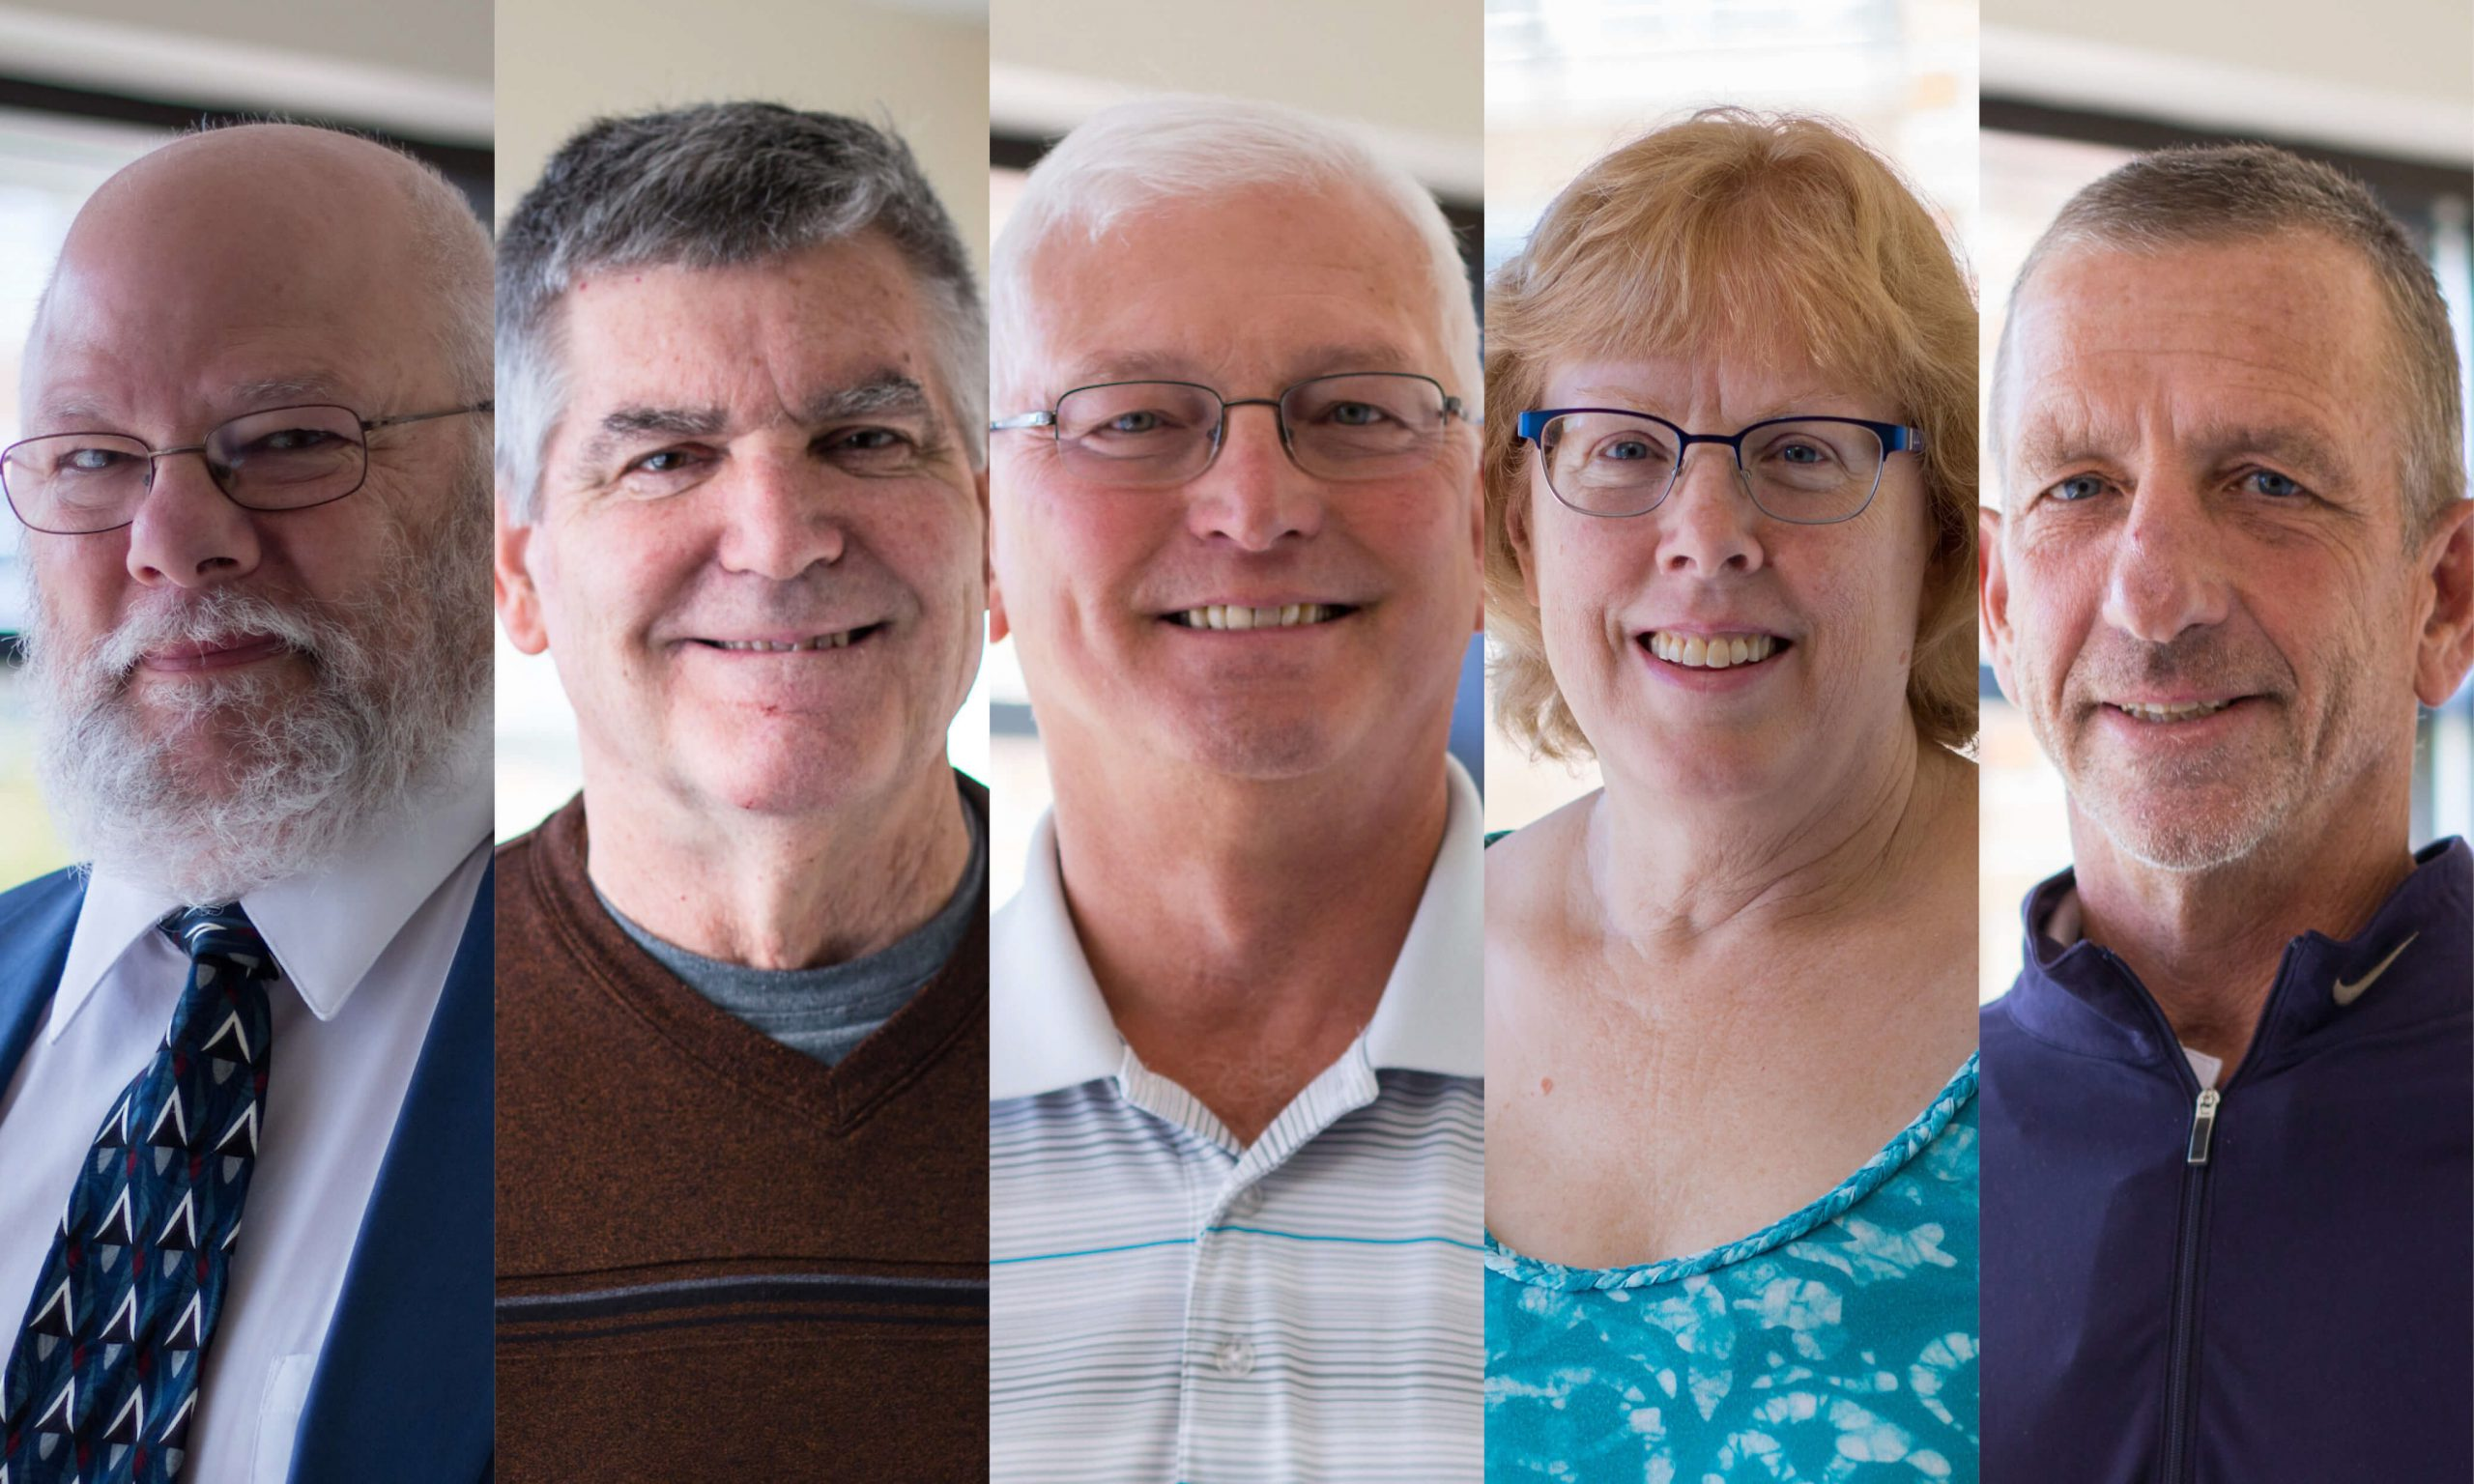 Concordia bids farewell to its retirees